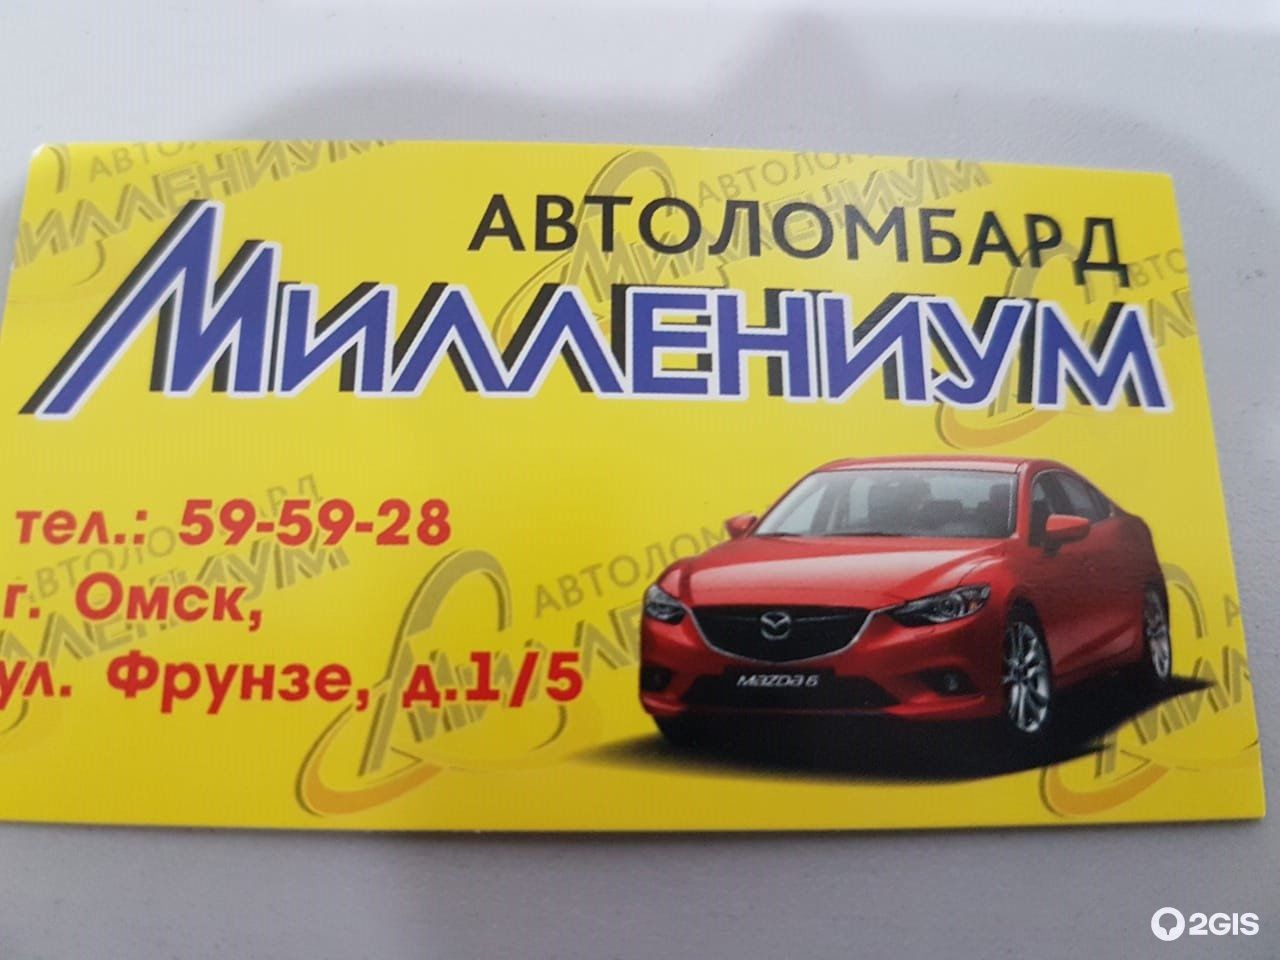 Авто ломбард в омске машины бу автосалоны москва